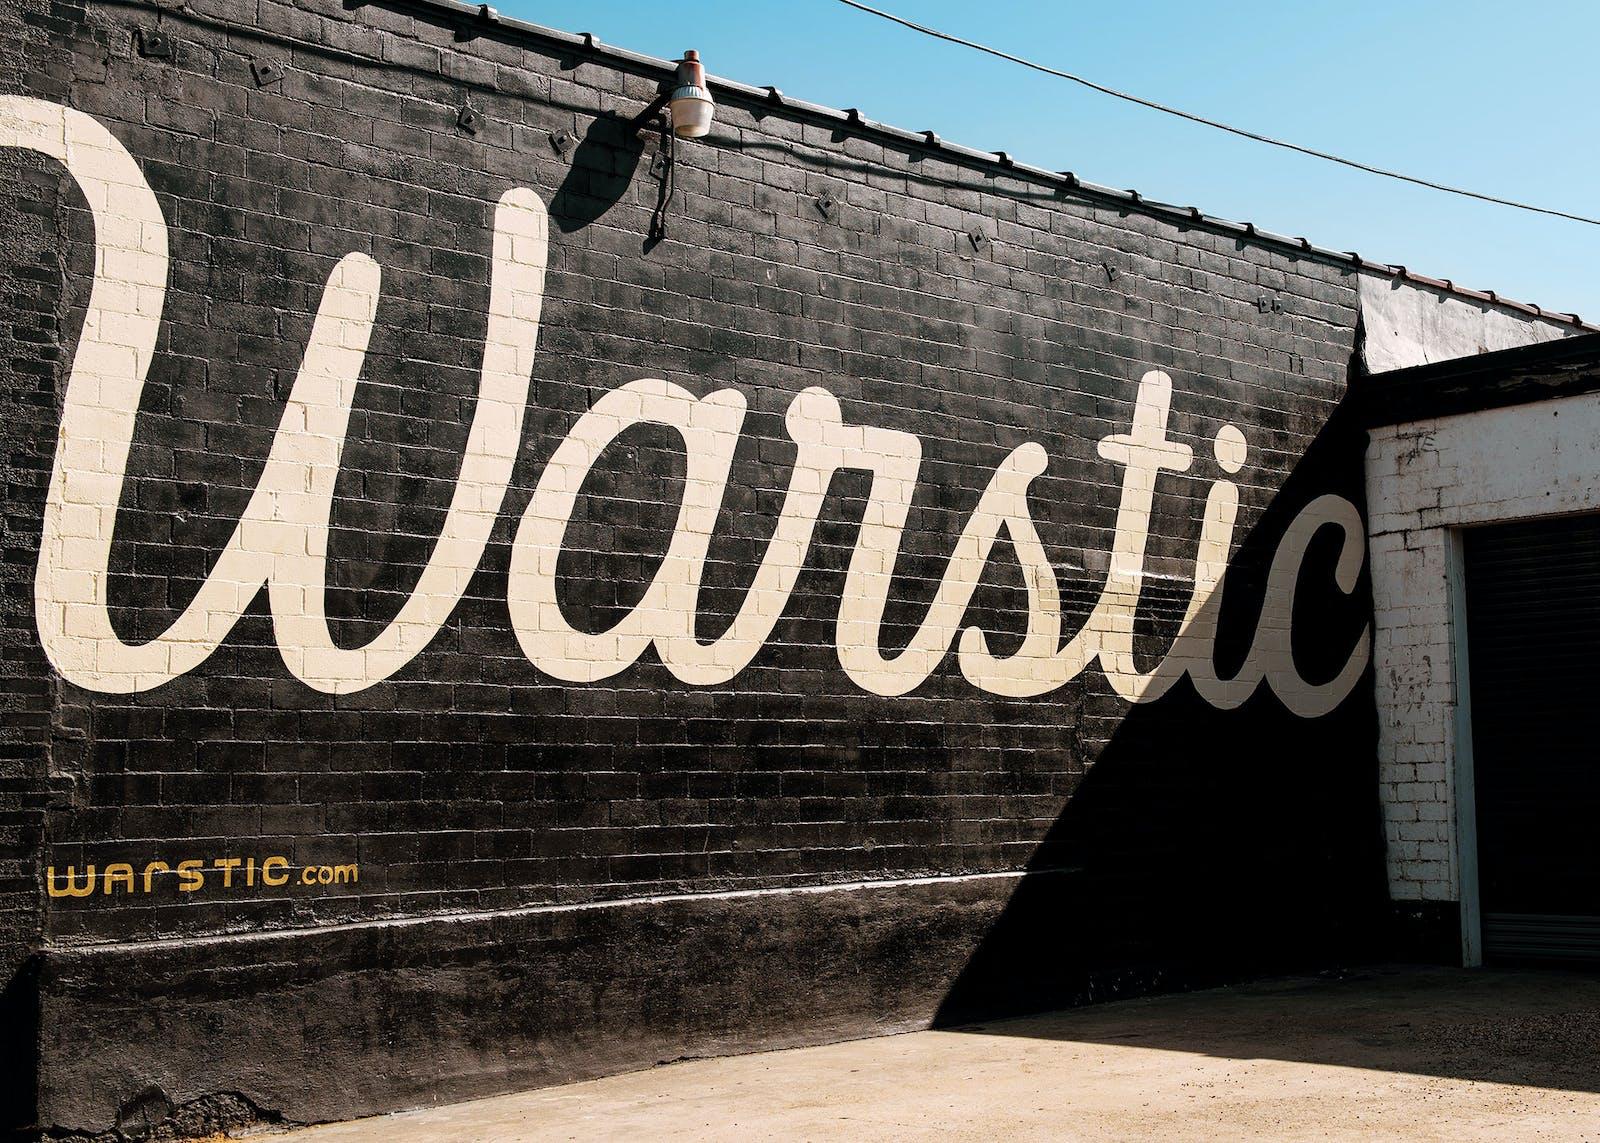 Warstic